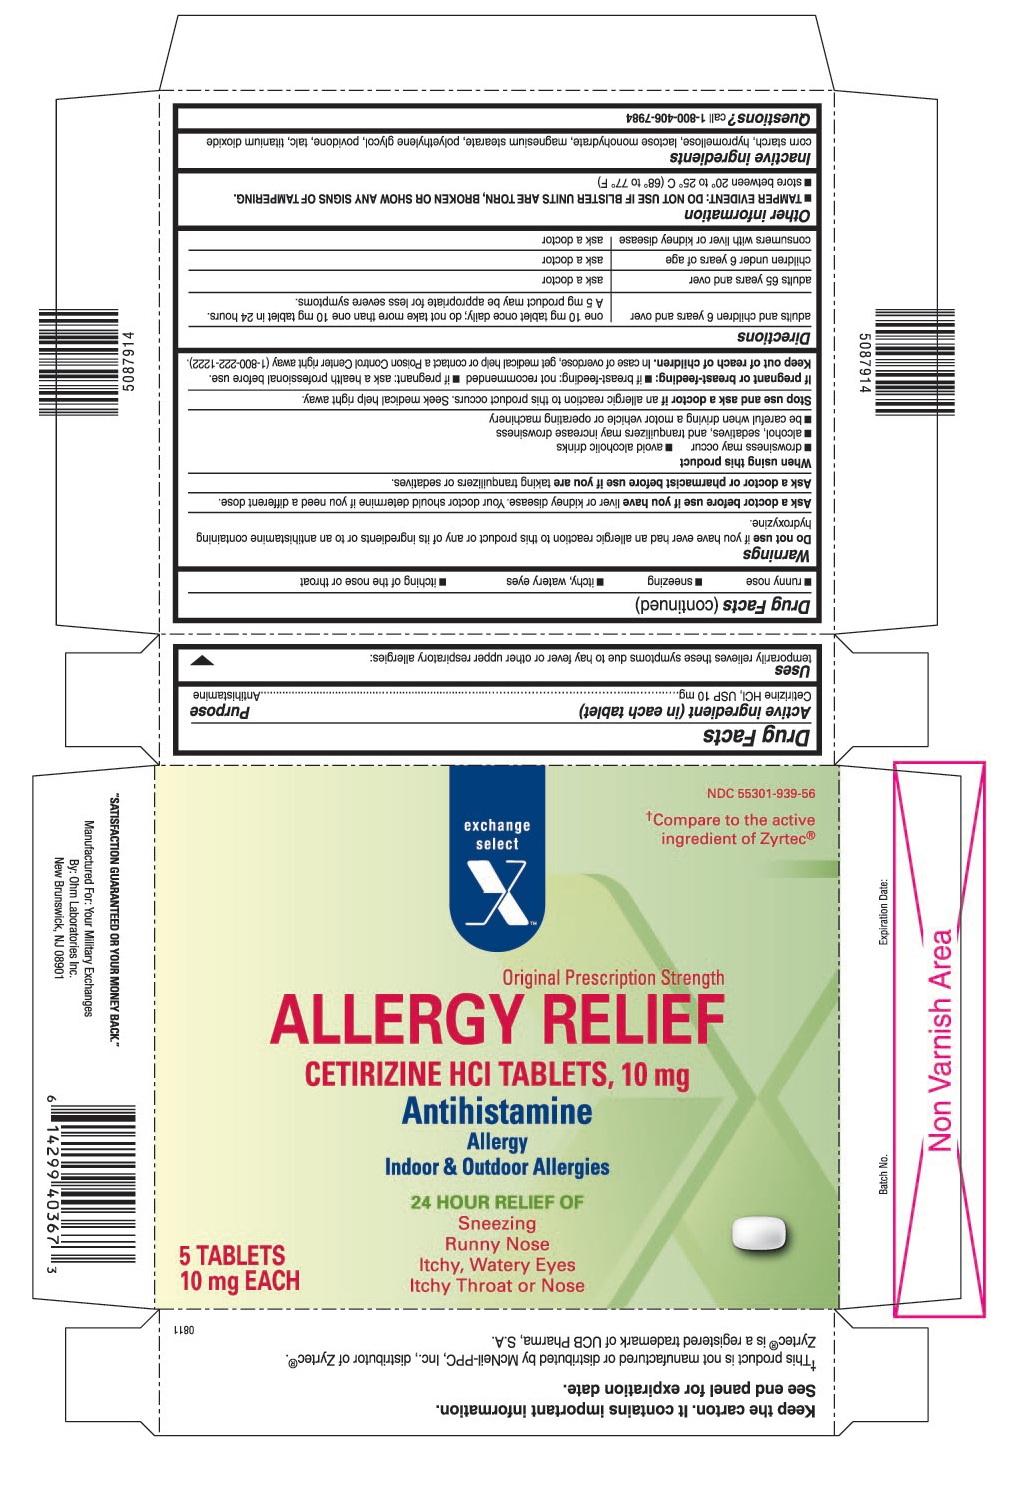 cetirizine hydrochloride 10 MG Oral Tablet - Pill Identification